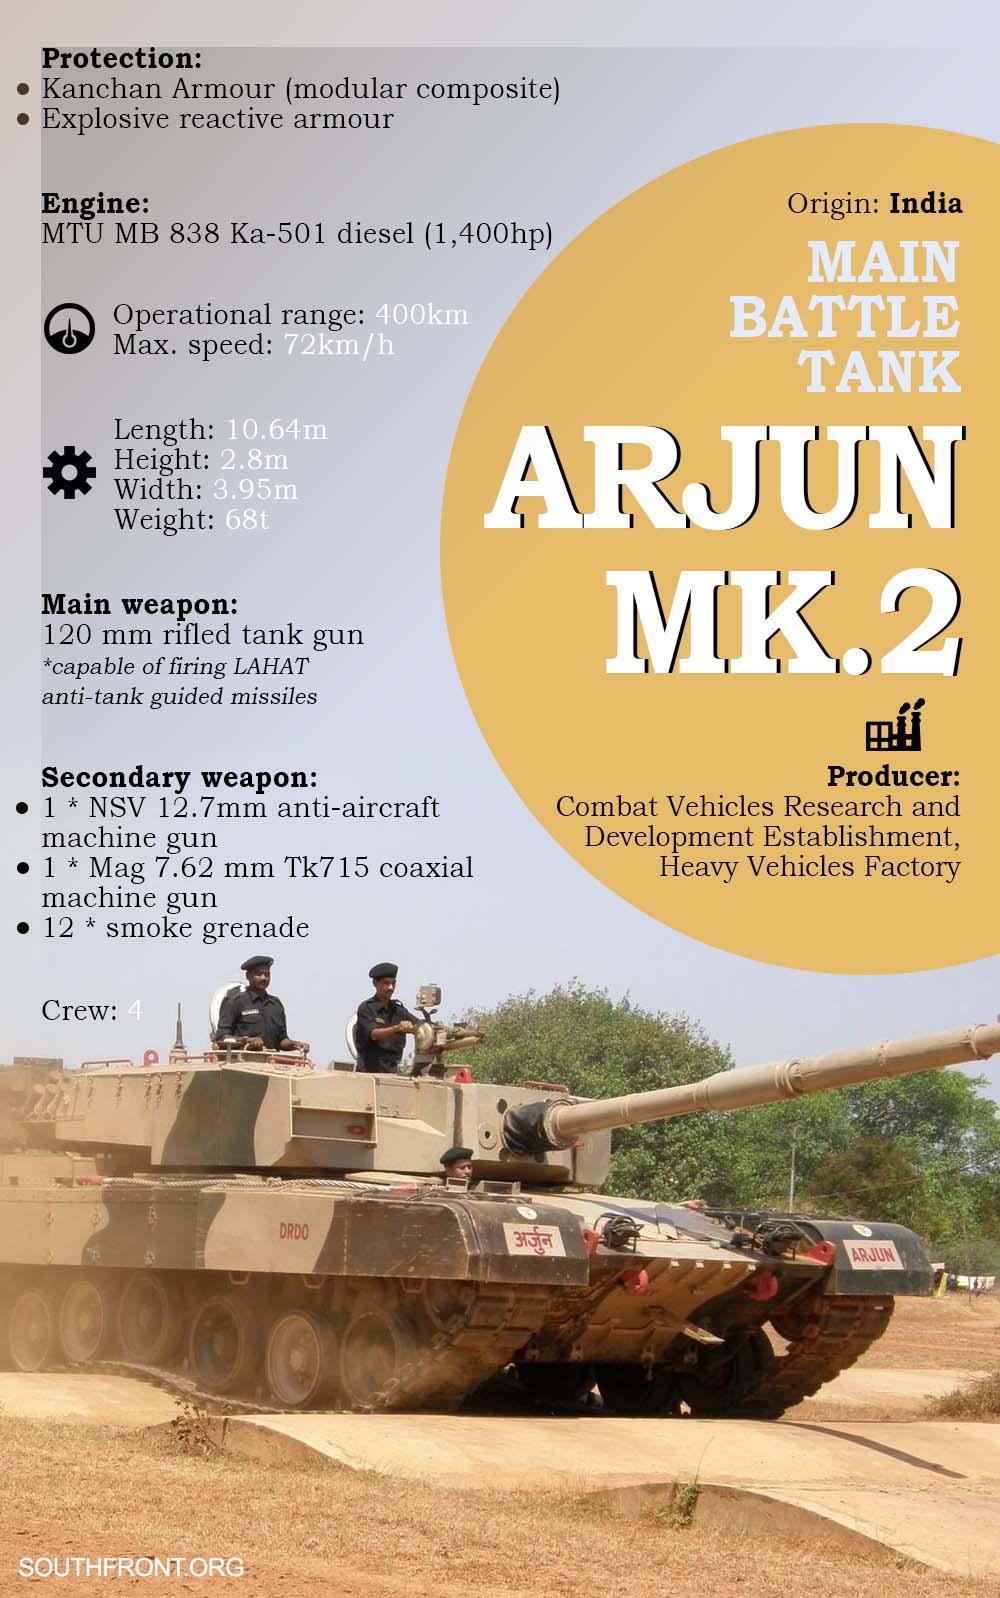 India's Arjun Mk II Main Battle Tank